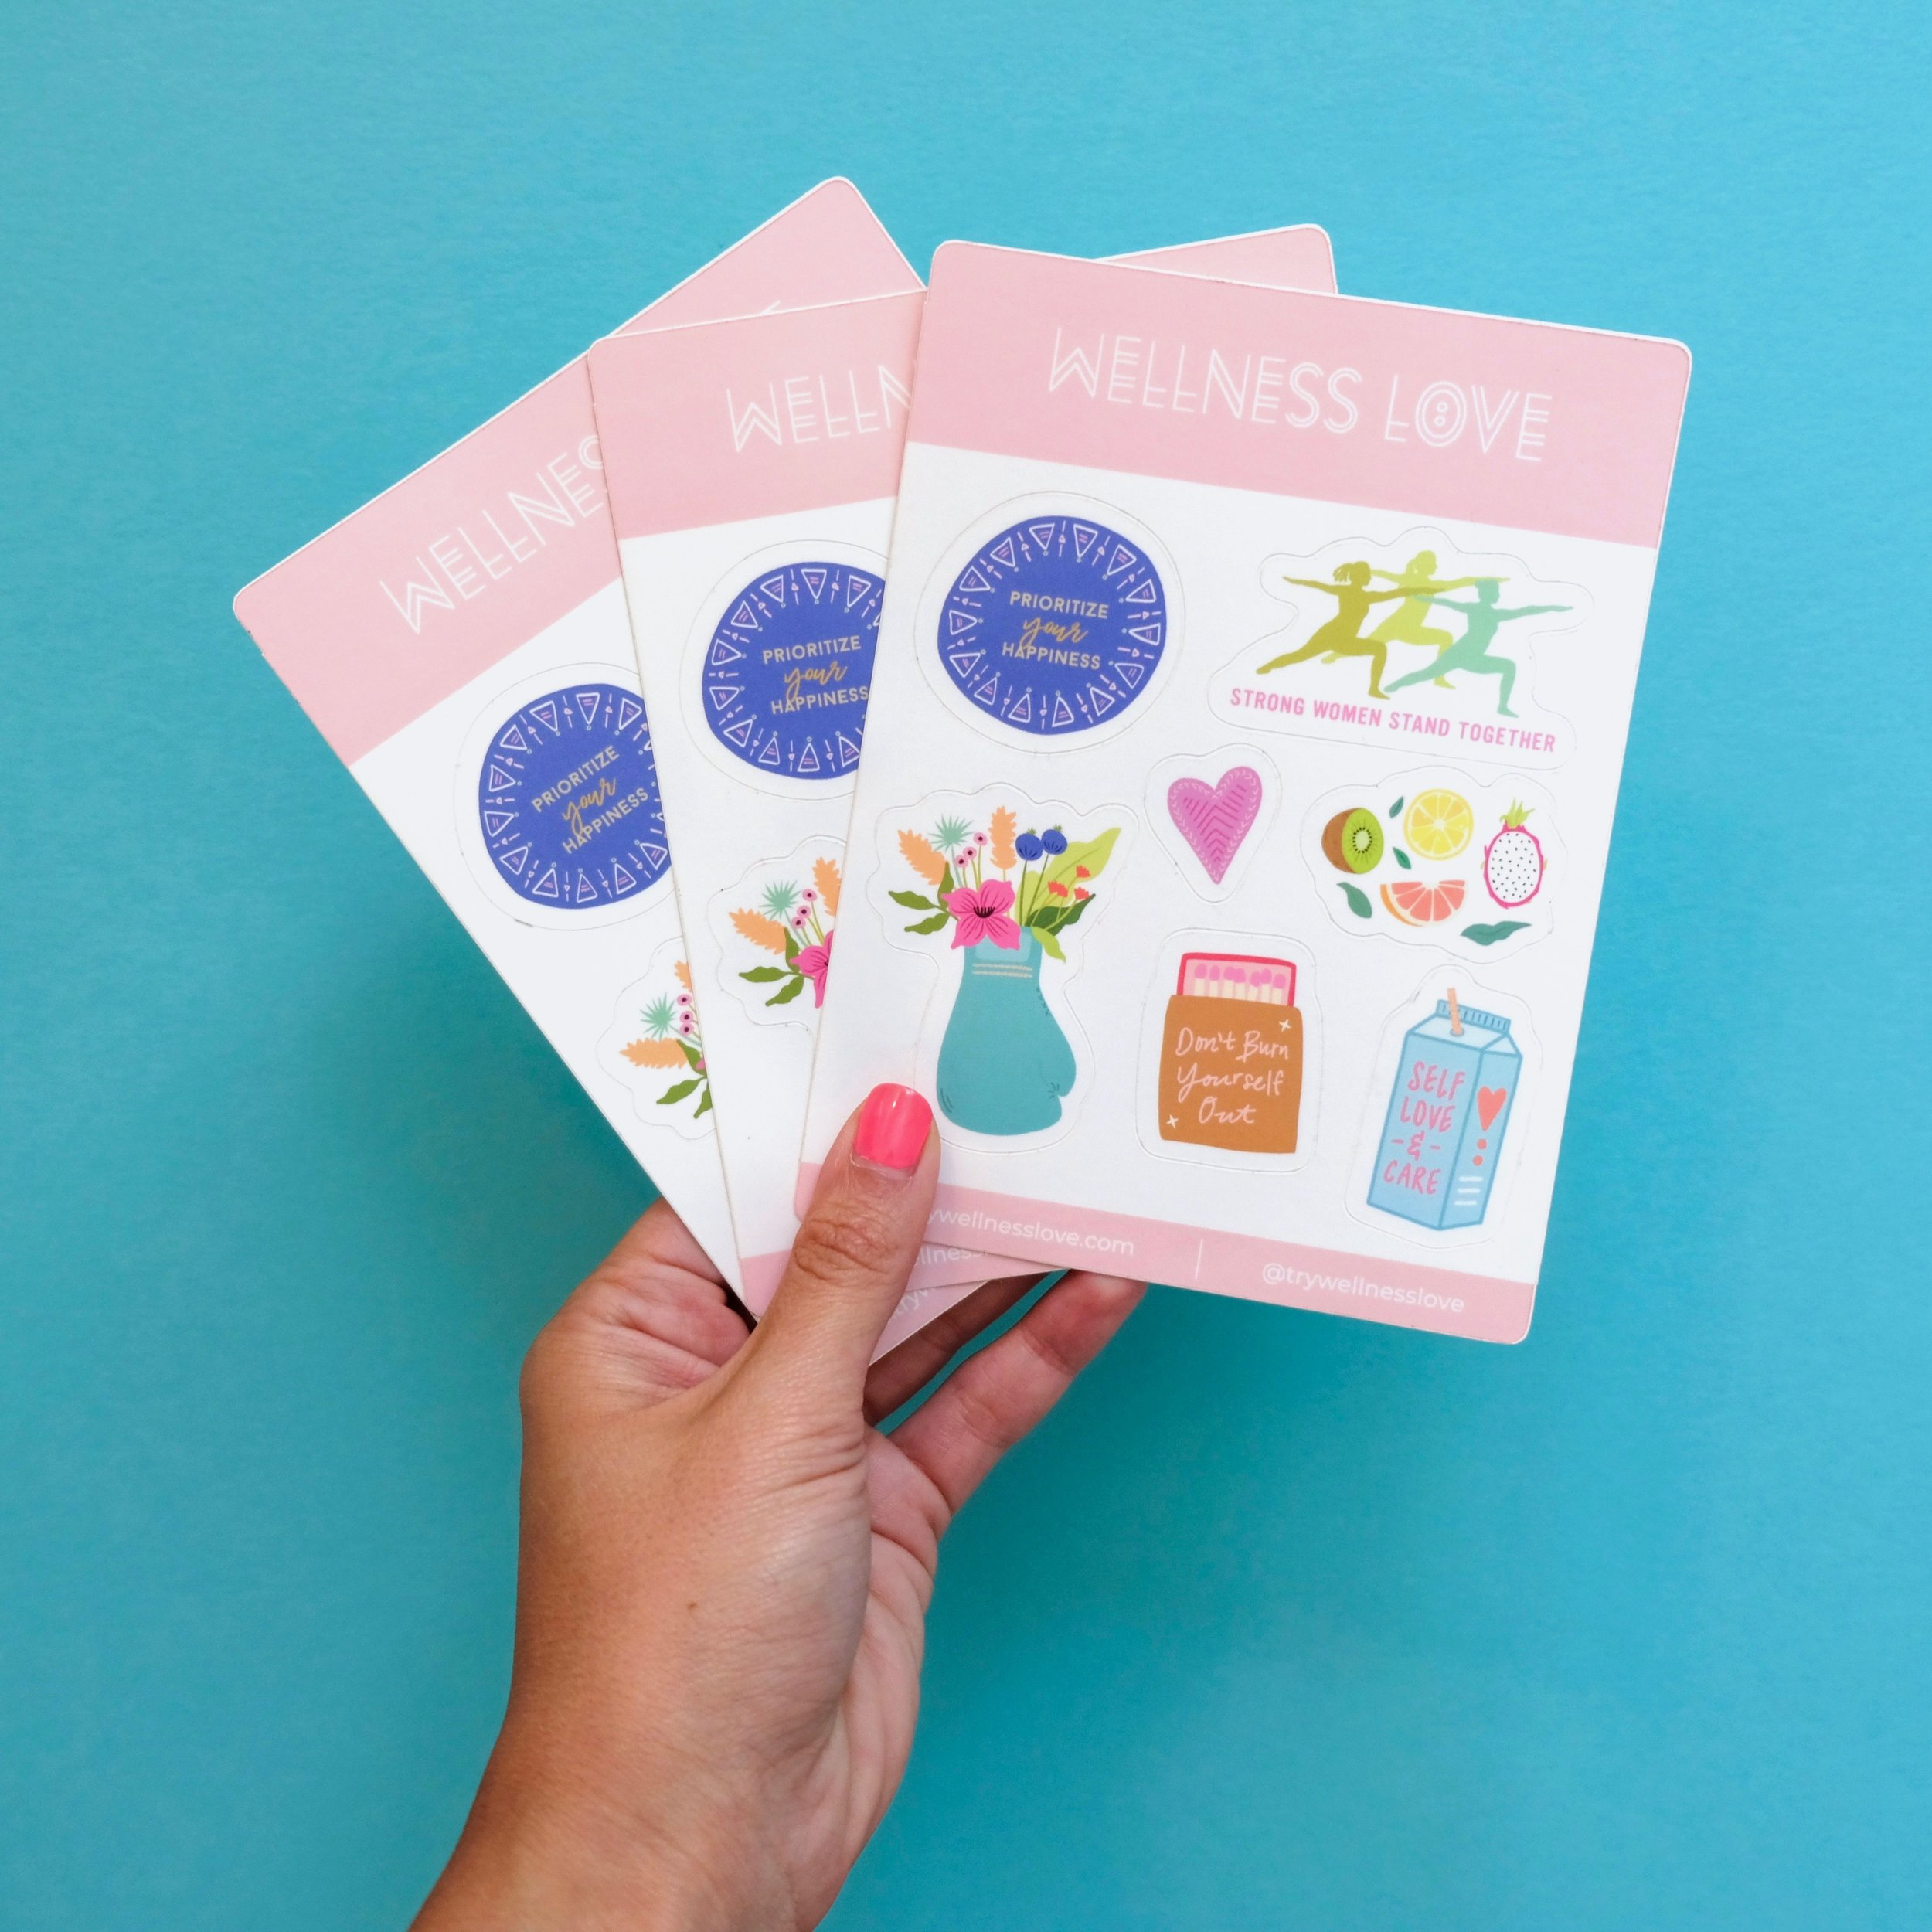 Wellness Love Sticker Sheets Cropped.jpeg